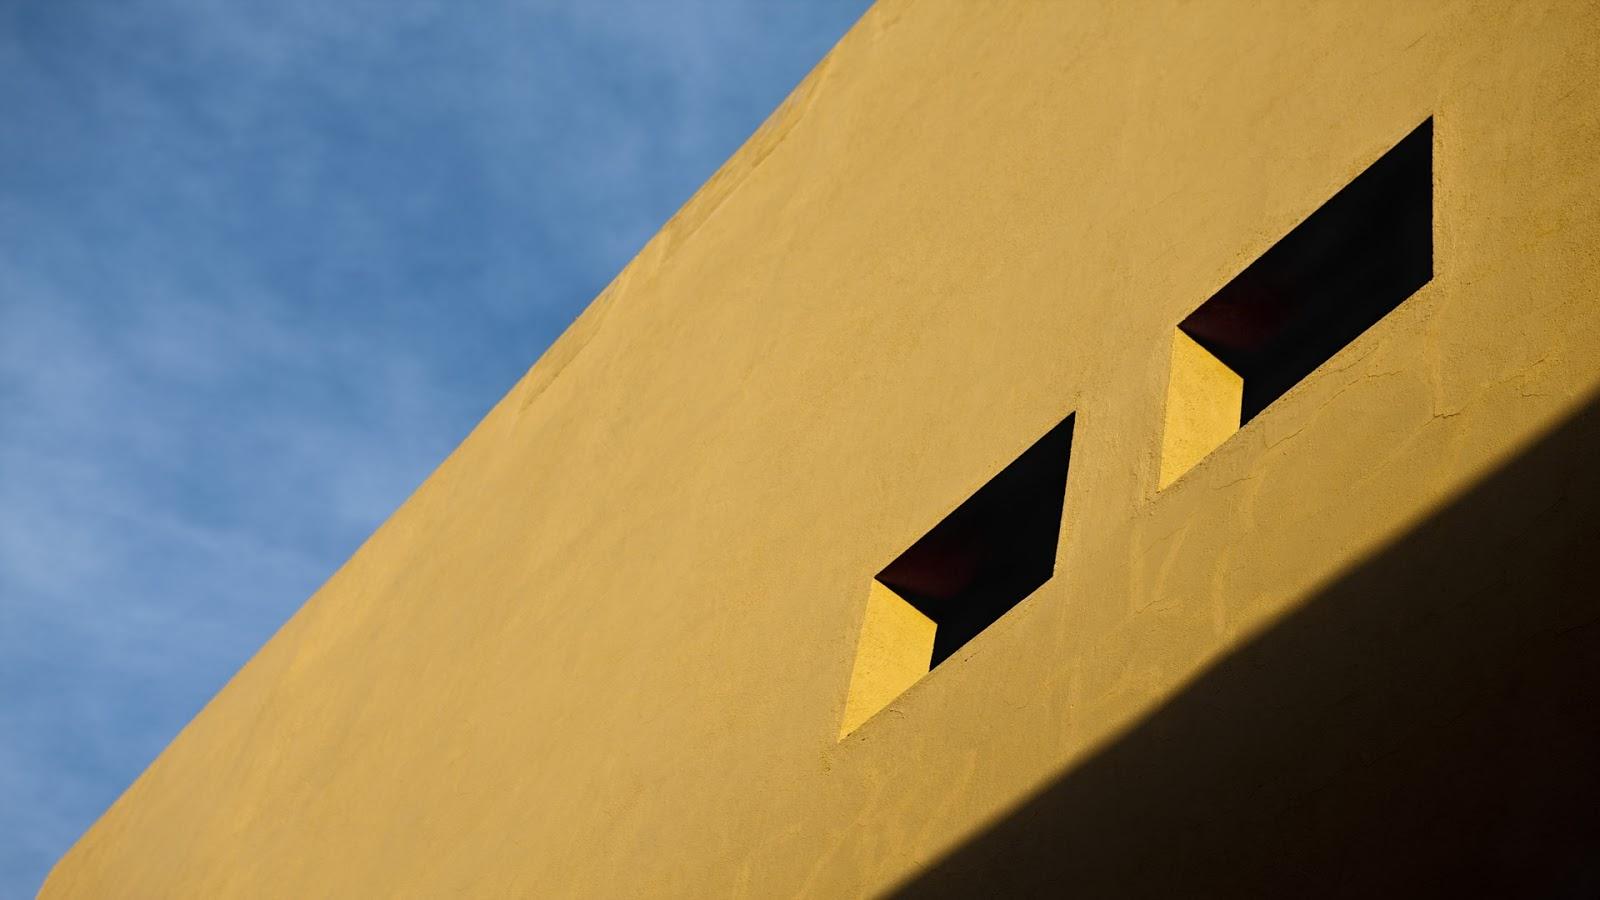 Download Architectural Structures PREMIUM, Tema per Windows 10